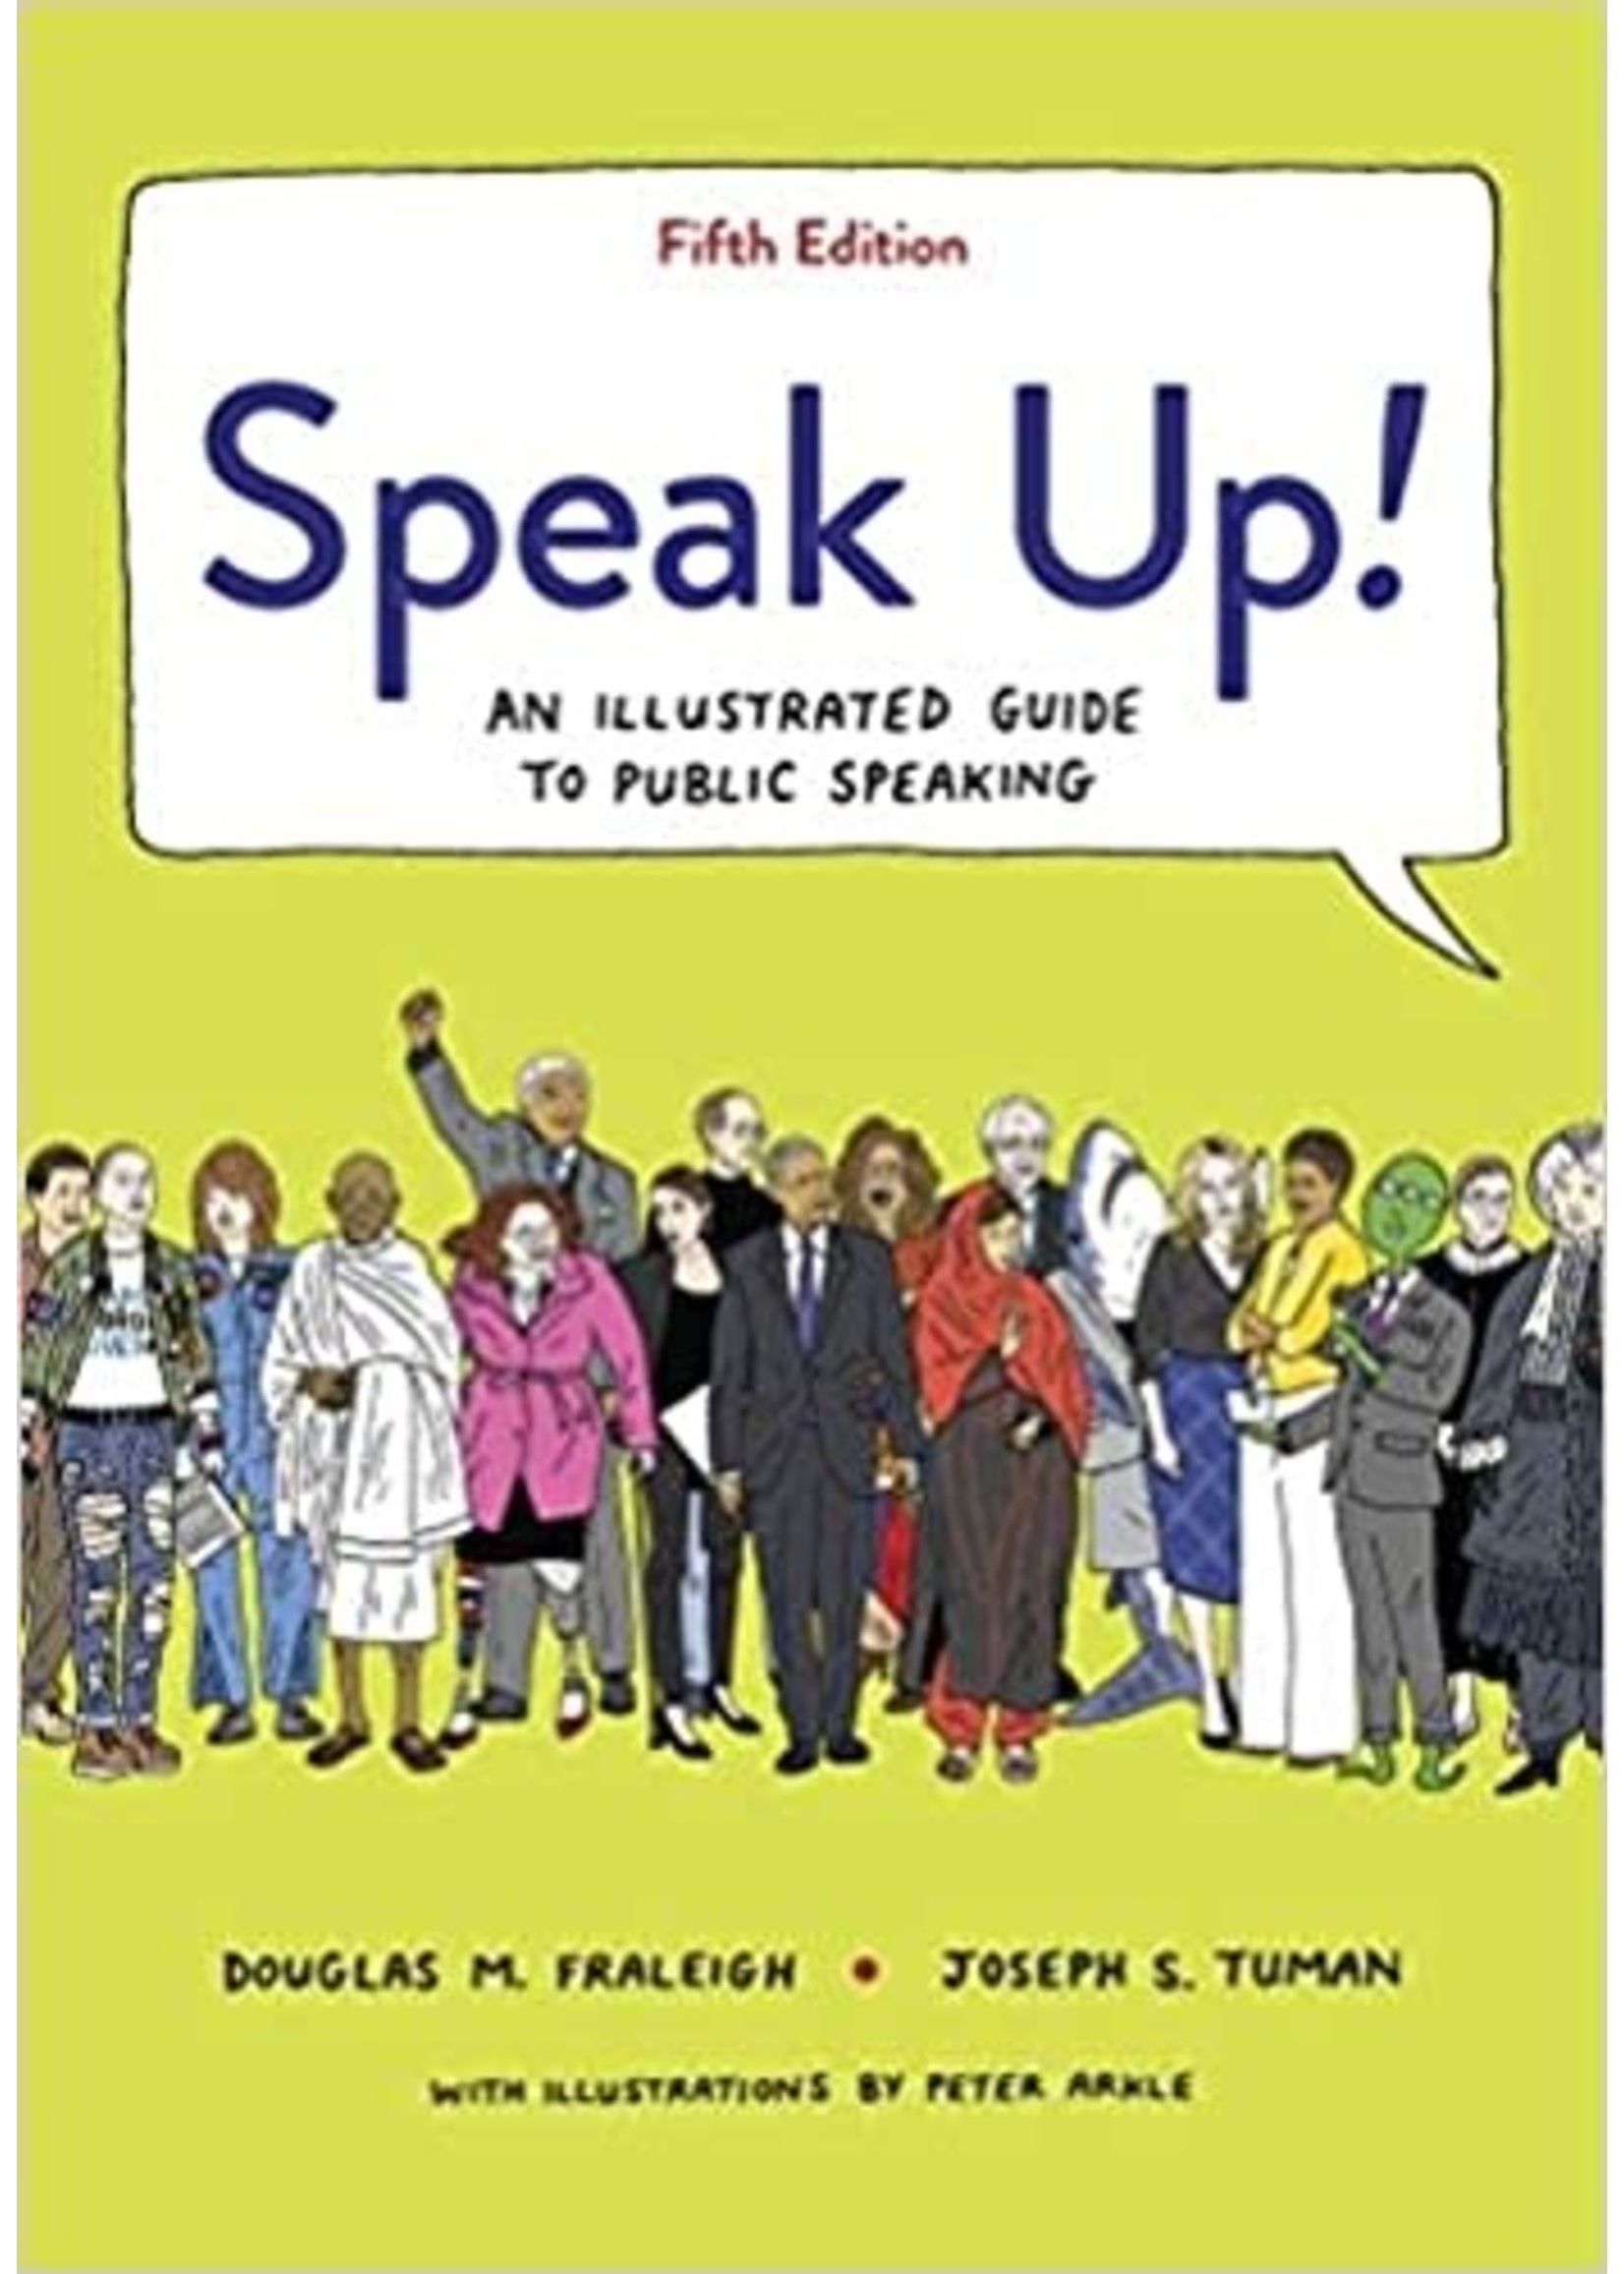 COMS140 SPEAK UP! ILLUSTRATED GUIDE TO PUBLIC SPEAKING